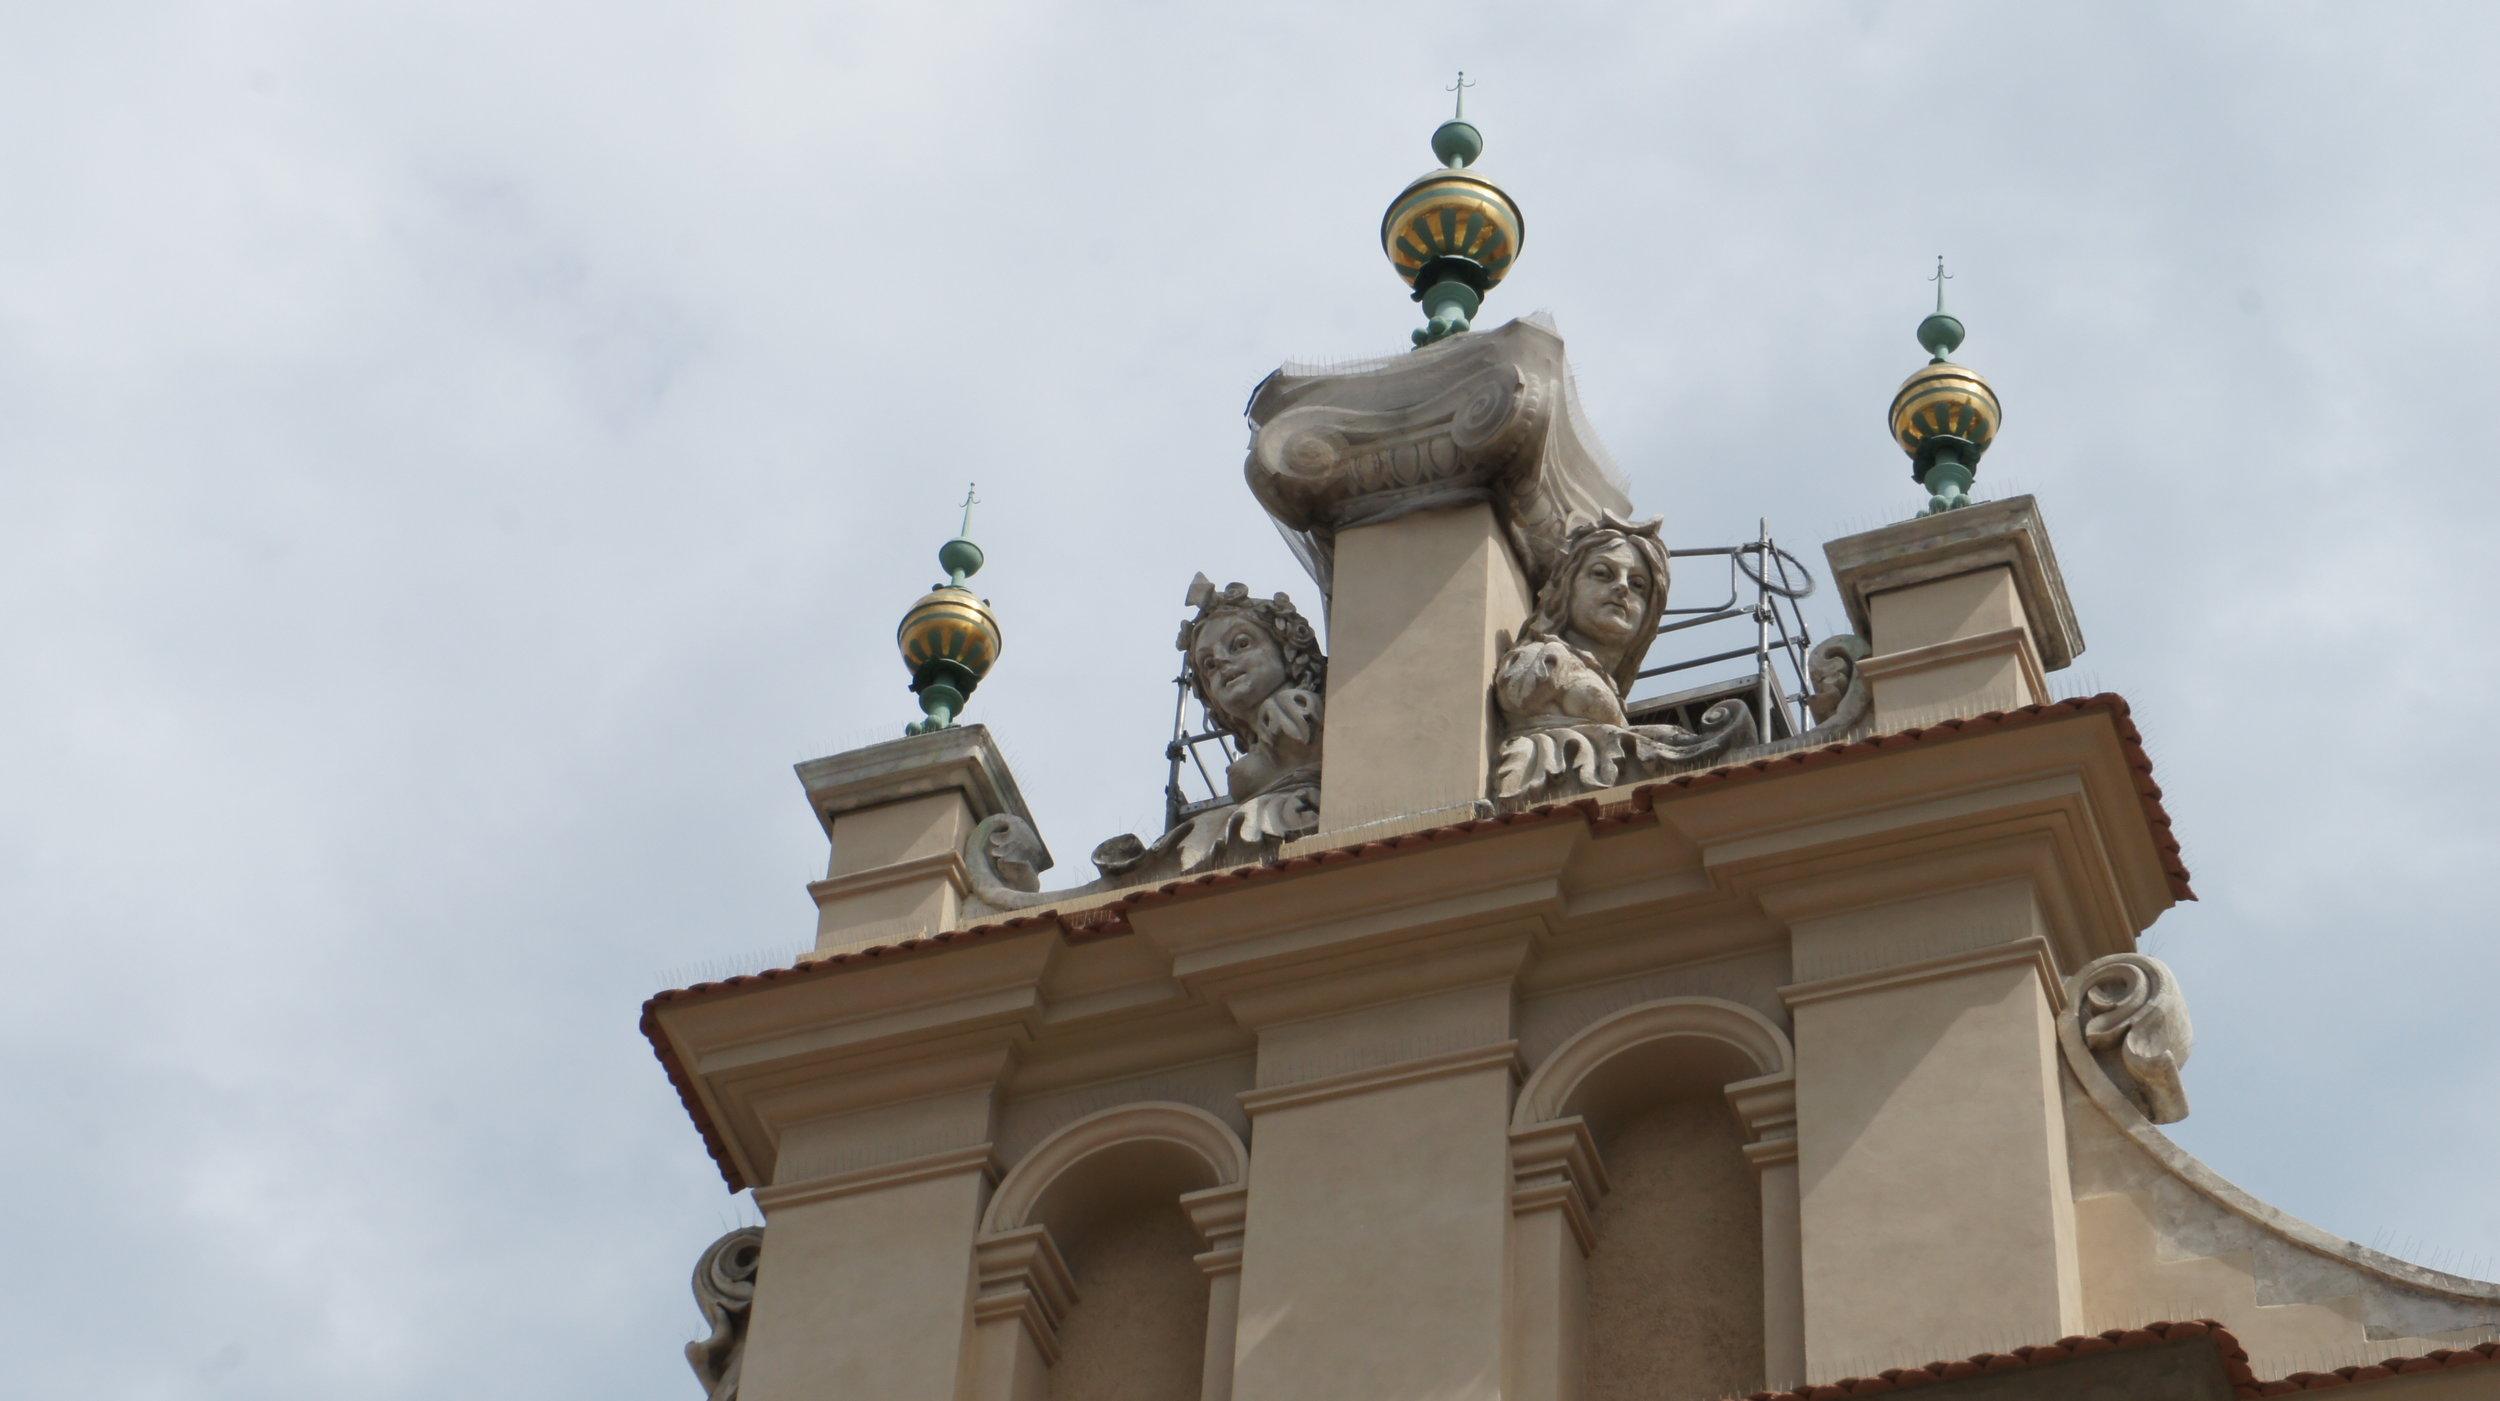 building in krakow, poland